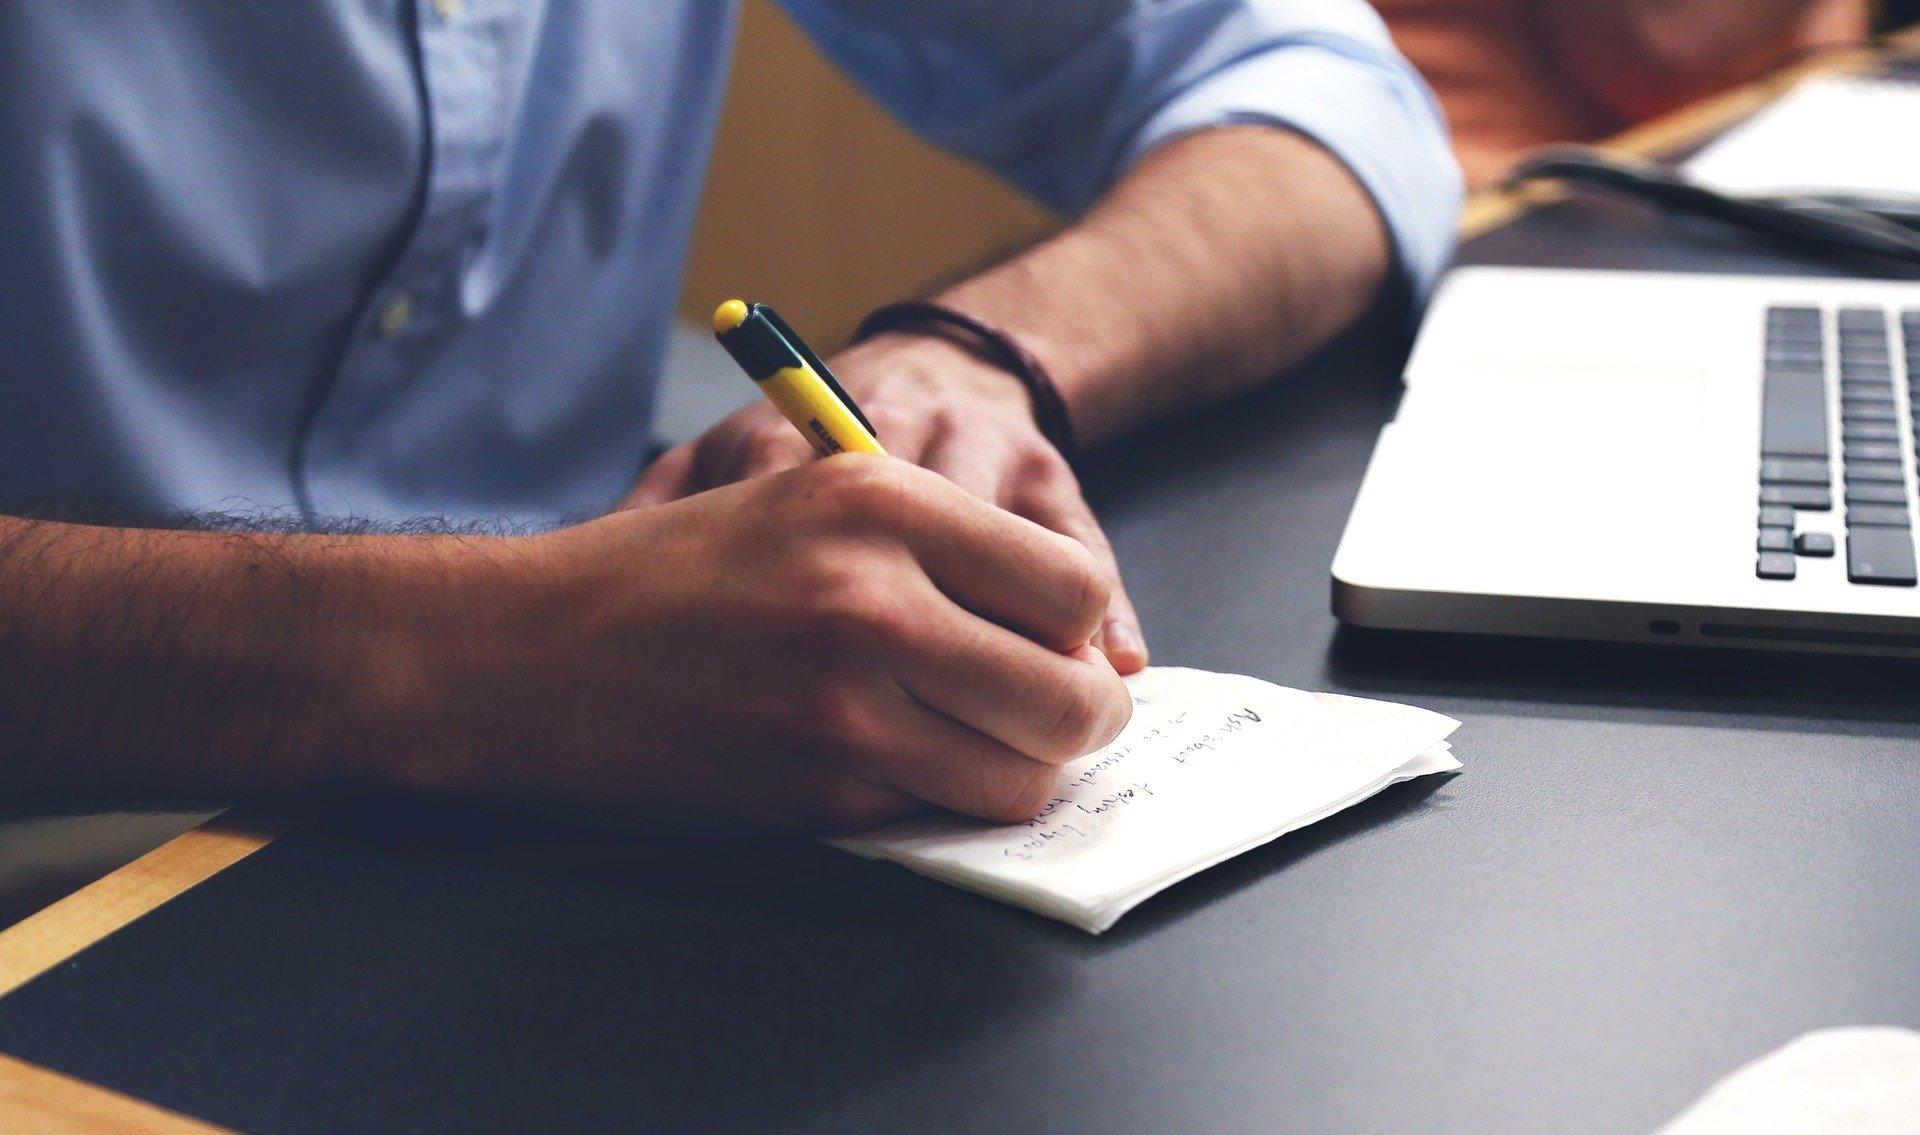 PREP法でかんたんにブログの書くスキルを上げてみよう!例を使って解説